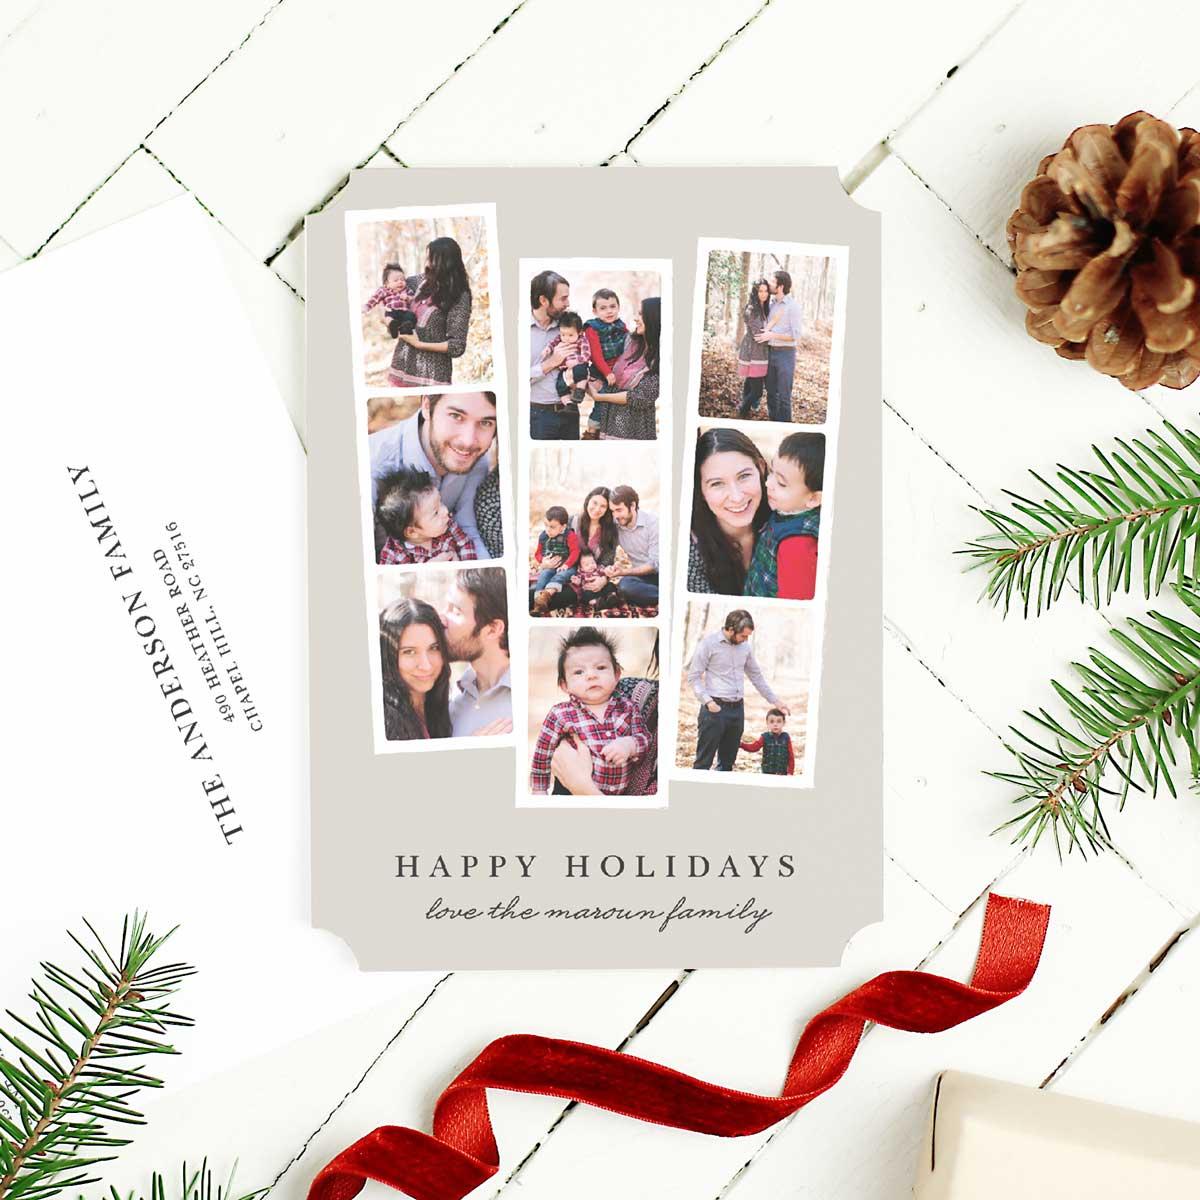 Basic_Invite_Holiday_Photo_Cards_10.jpg